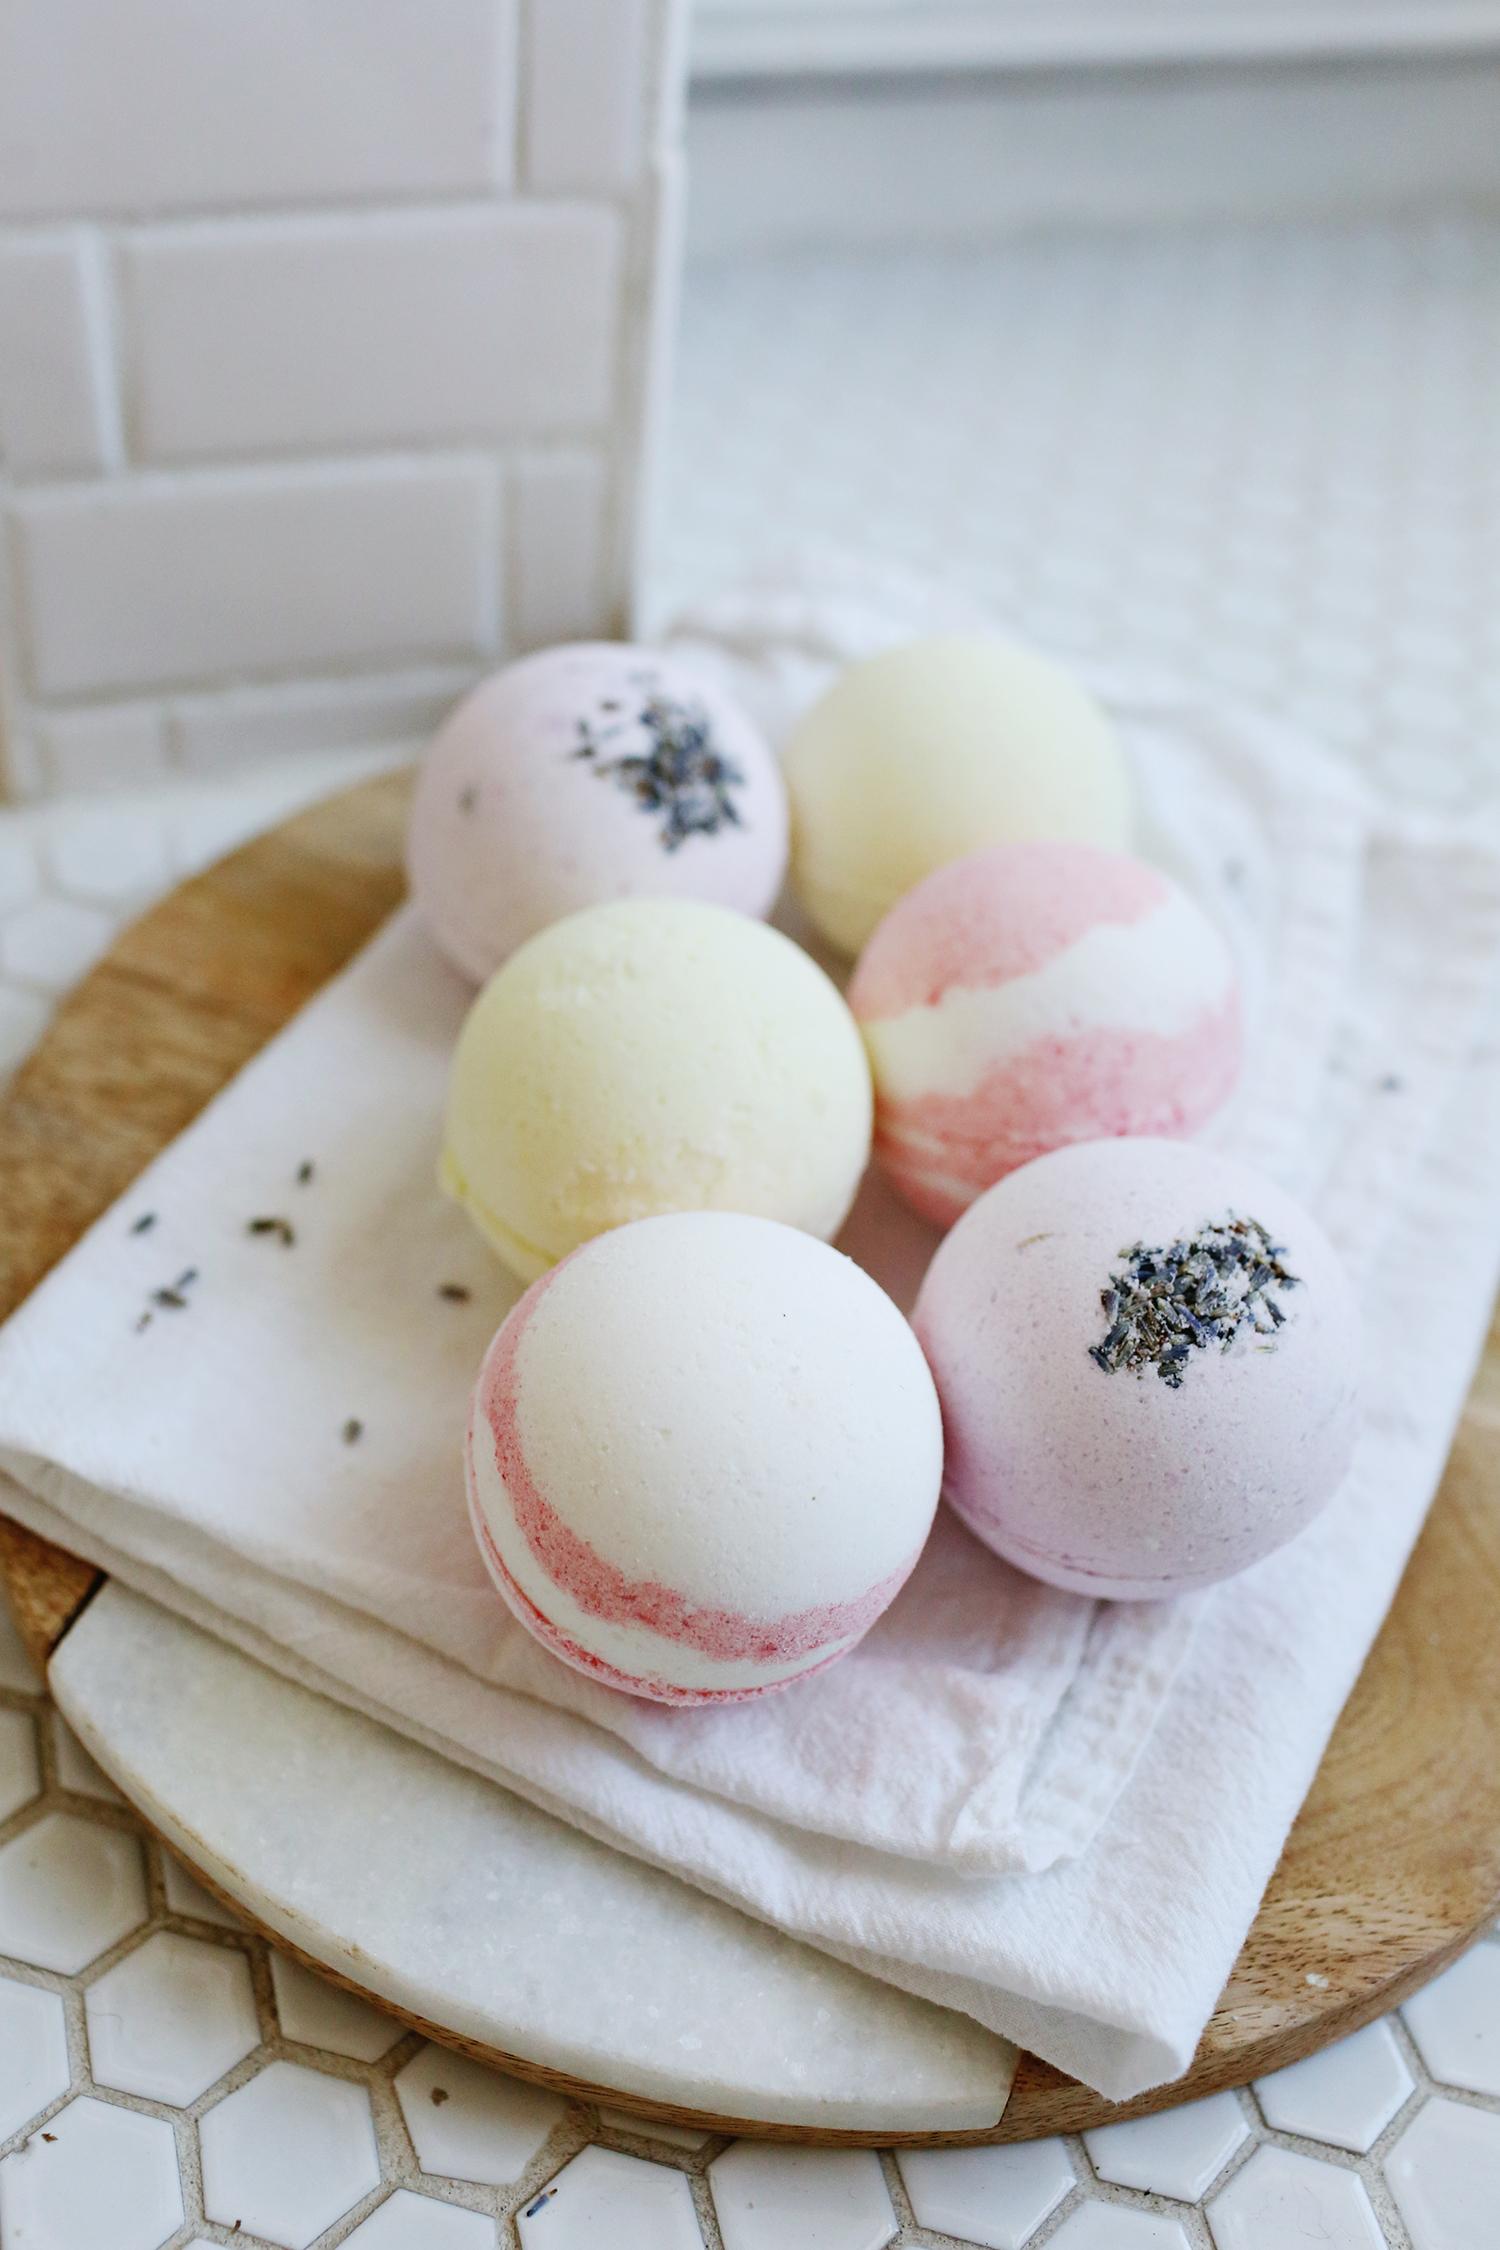 Easy homemade bath bombs